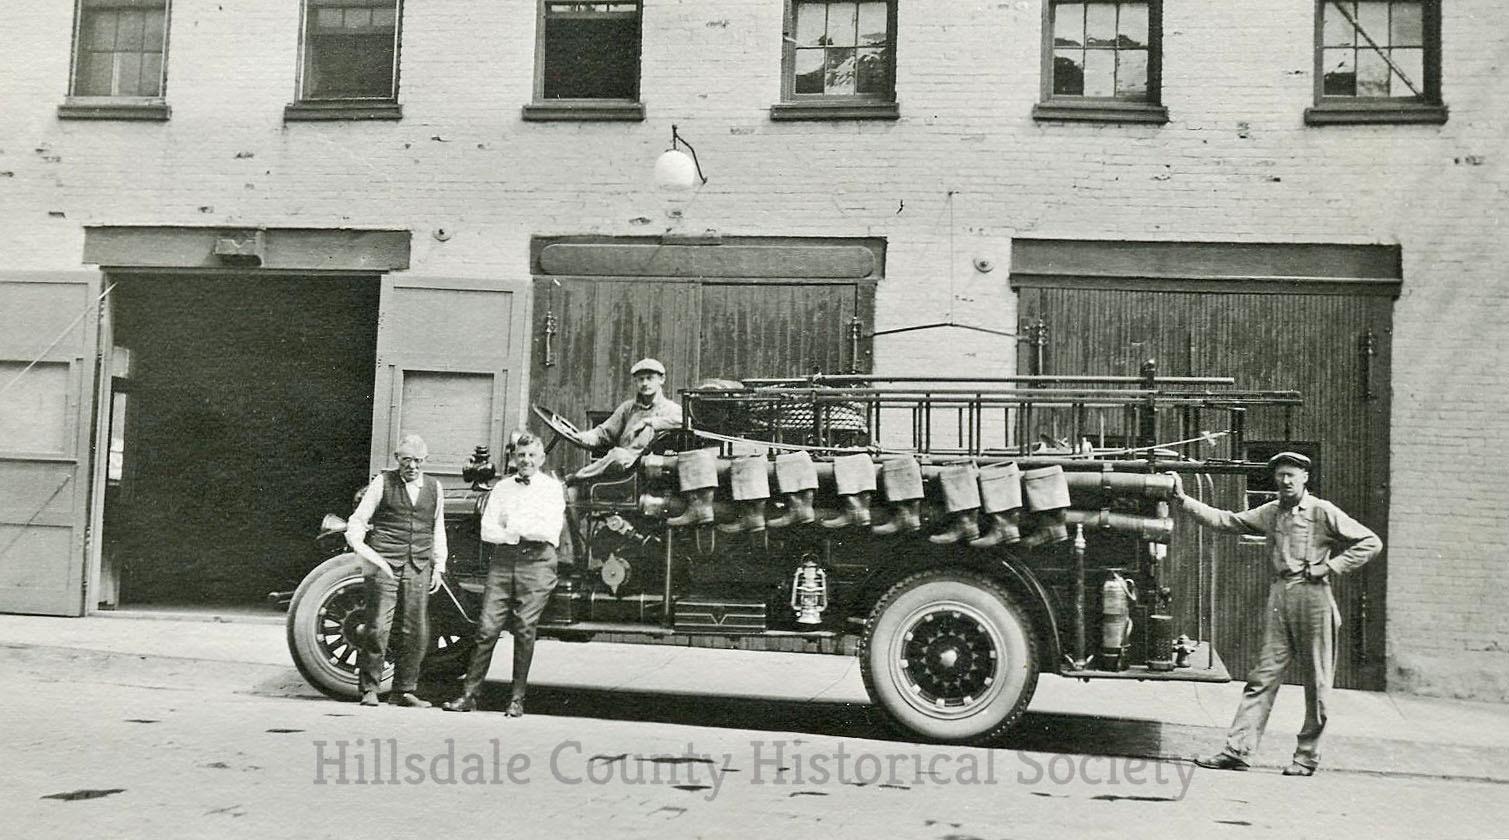 fire - McCollum St. early 1900s.jpg